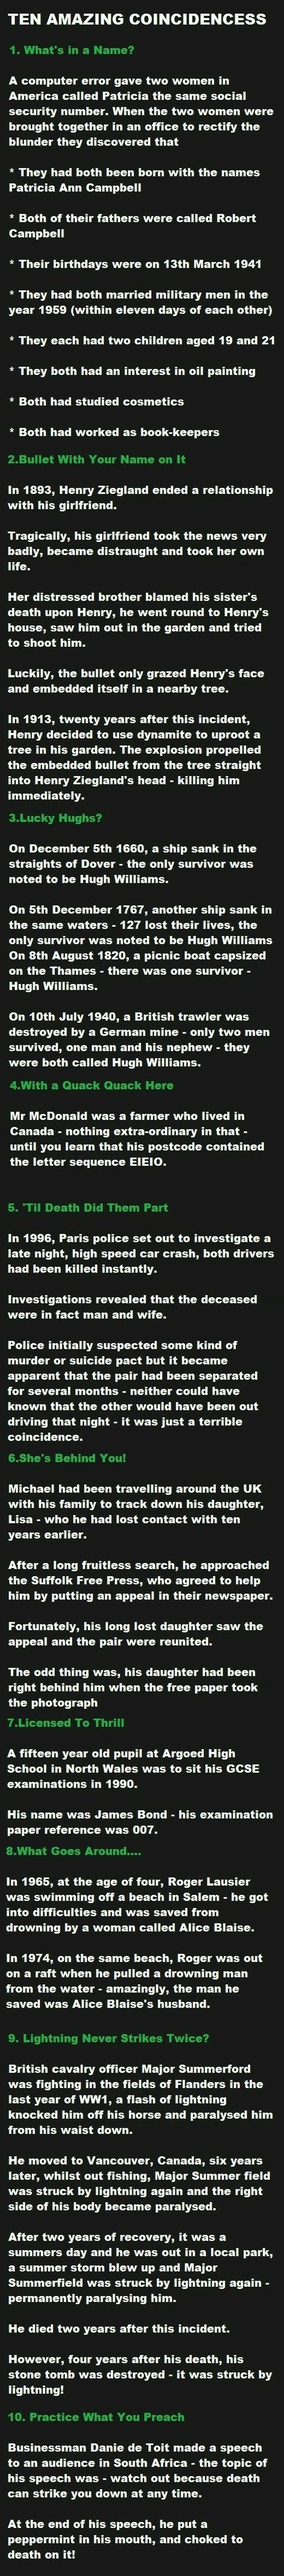 10 Amazing Facts